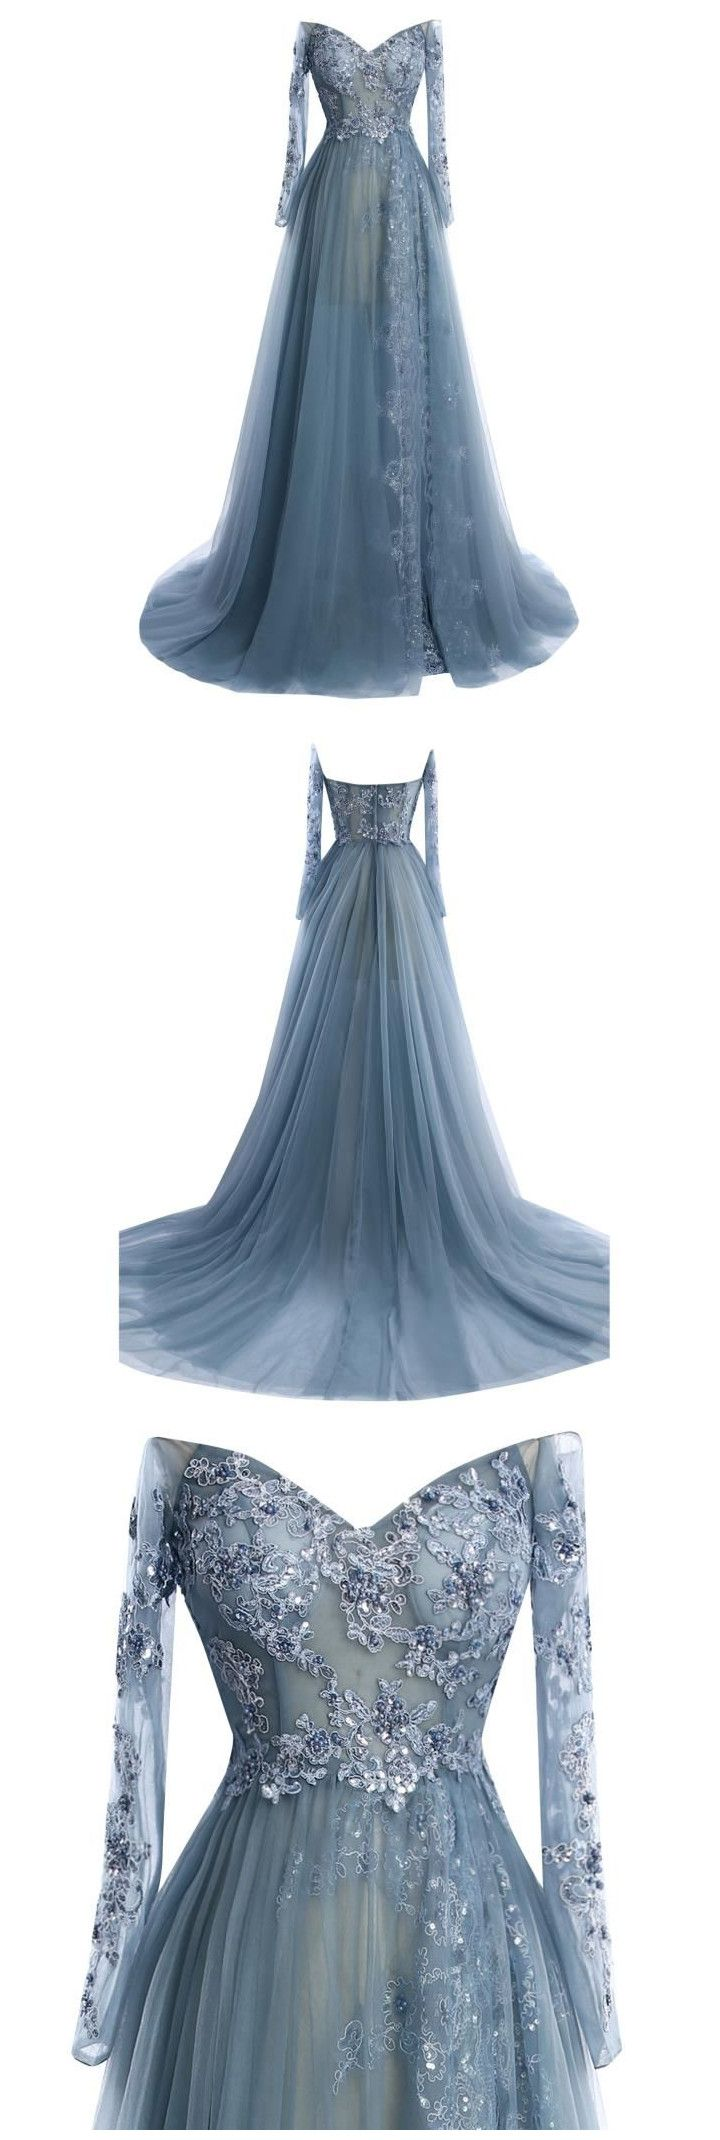 Long sleeve charming prom dresslong prom dressescharming